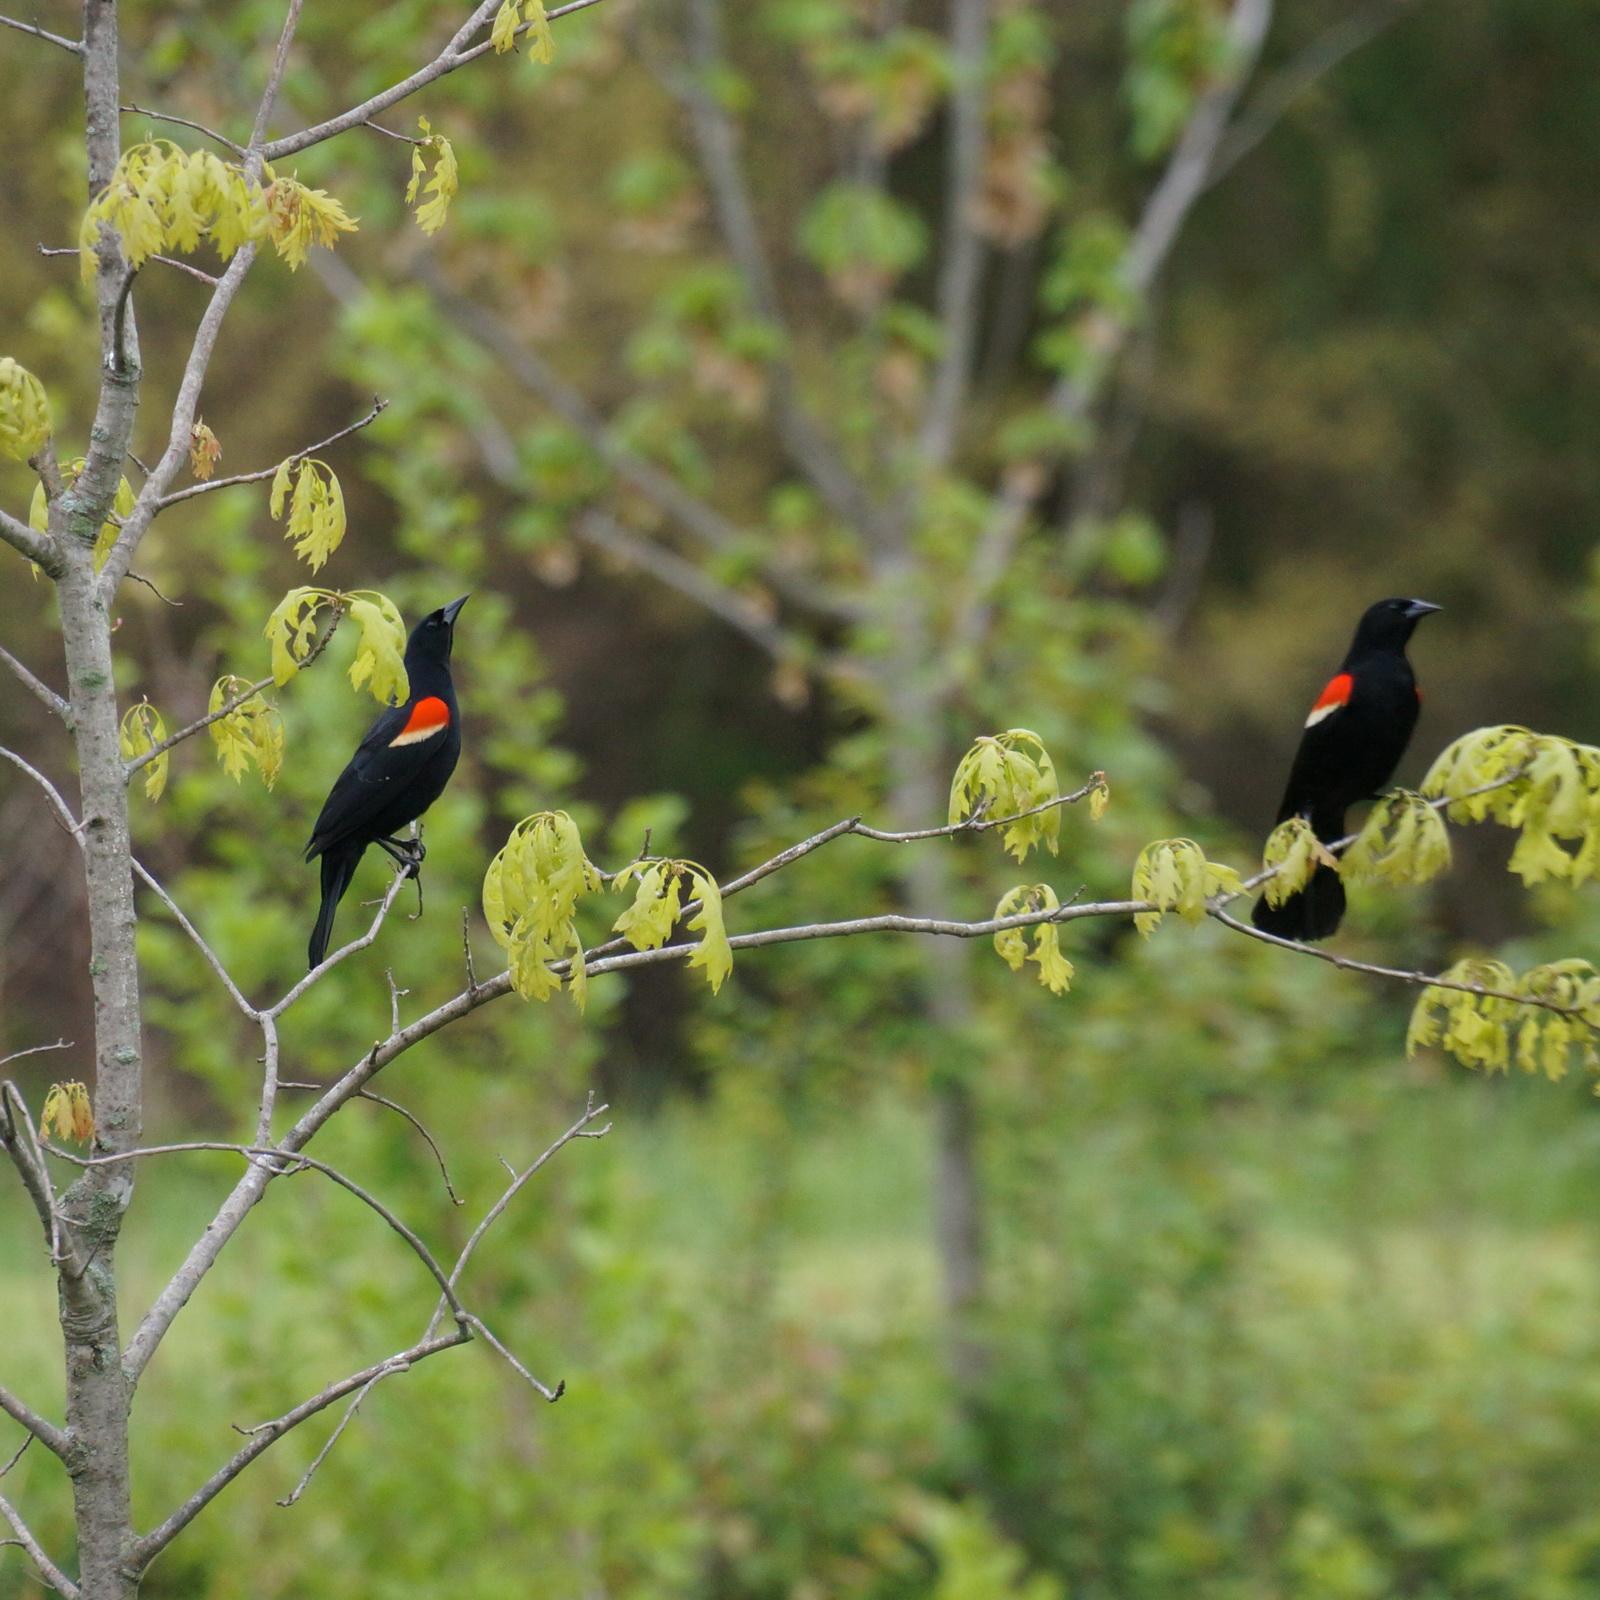 2 redwinged blackbirds_resize.jpg